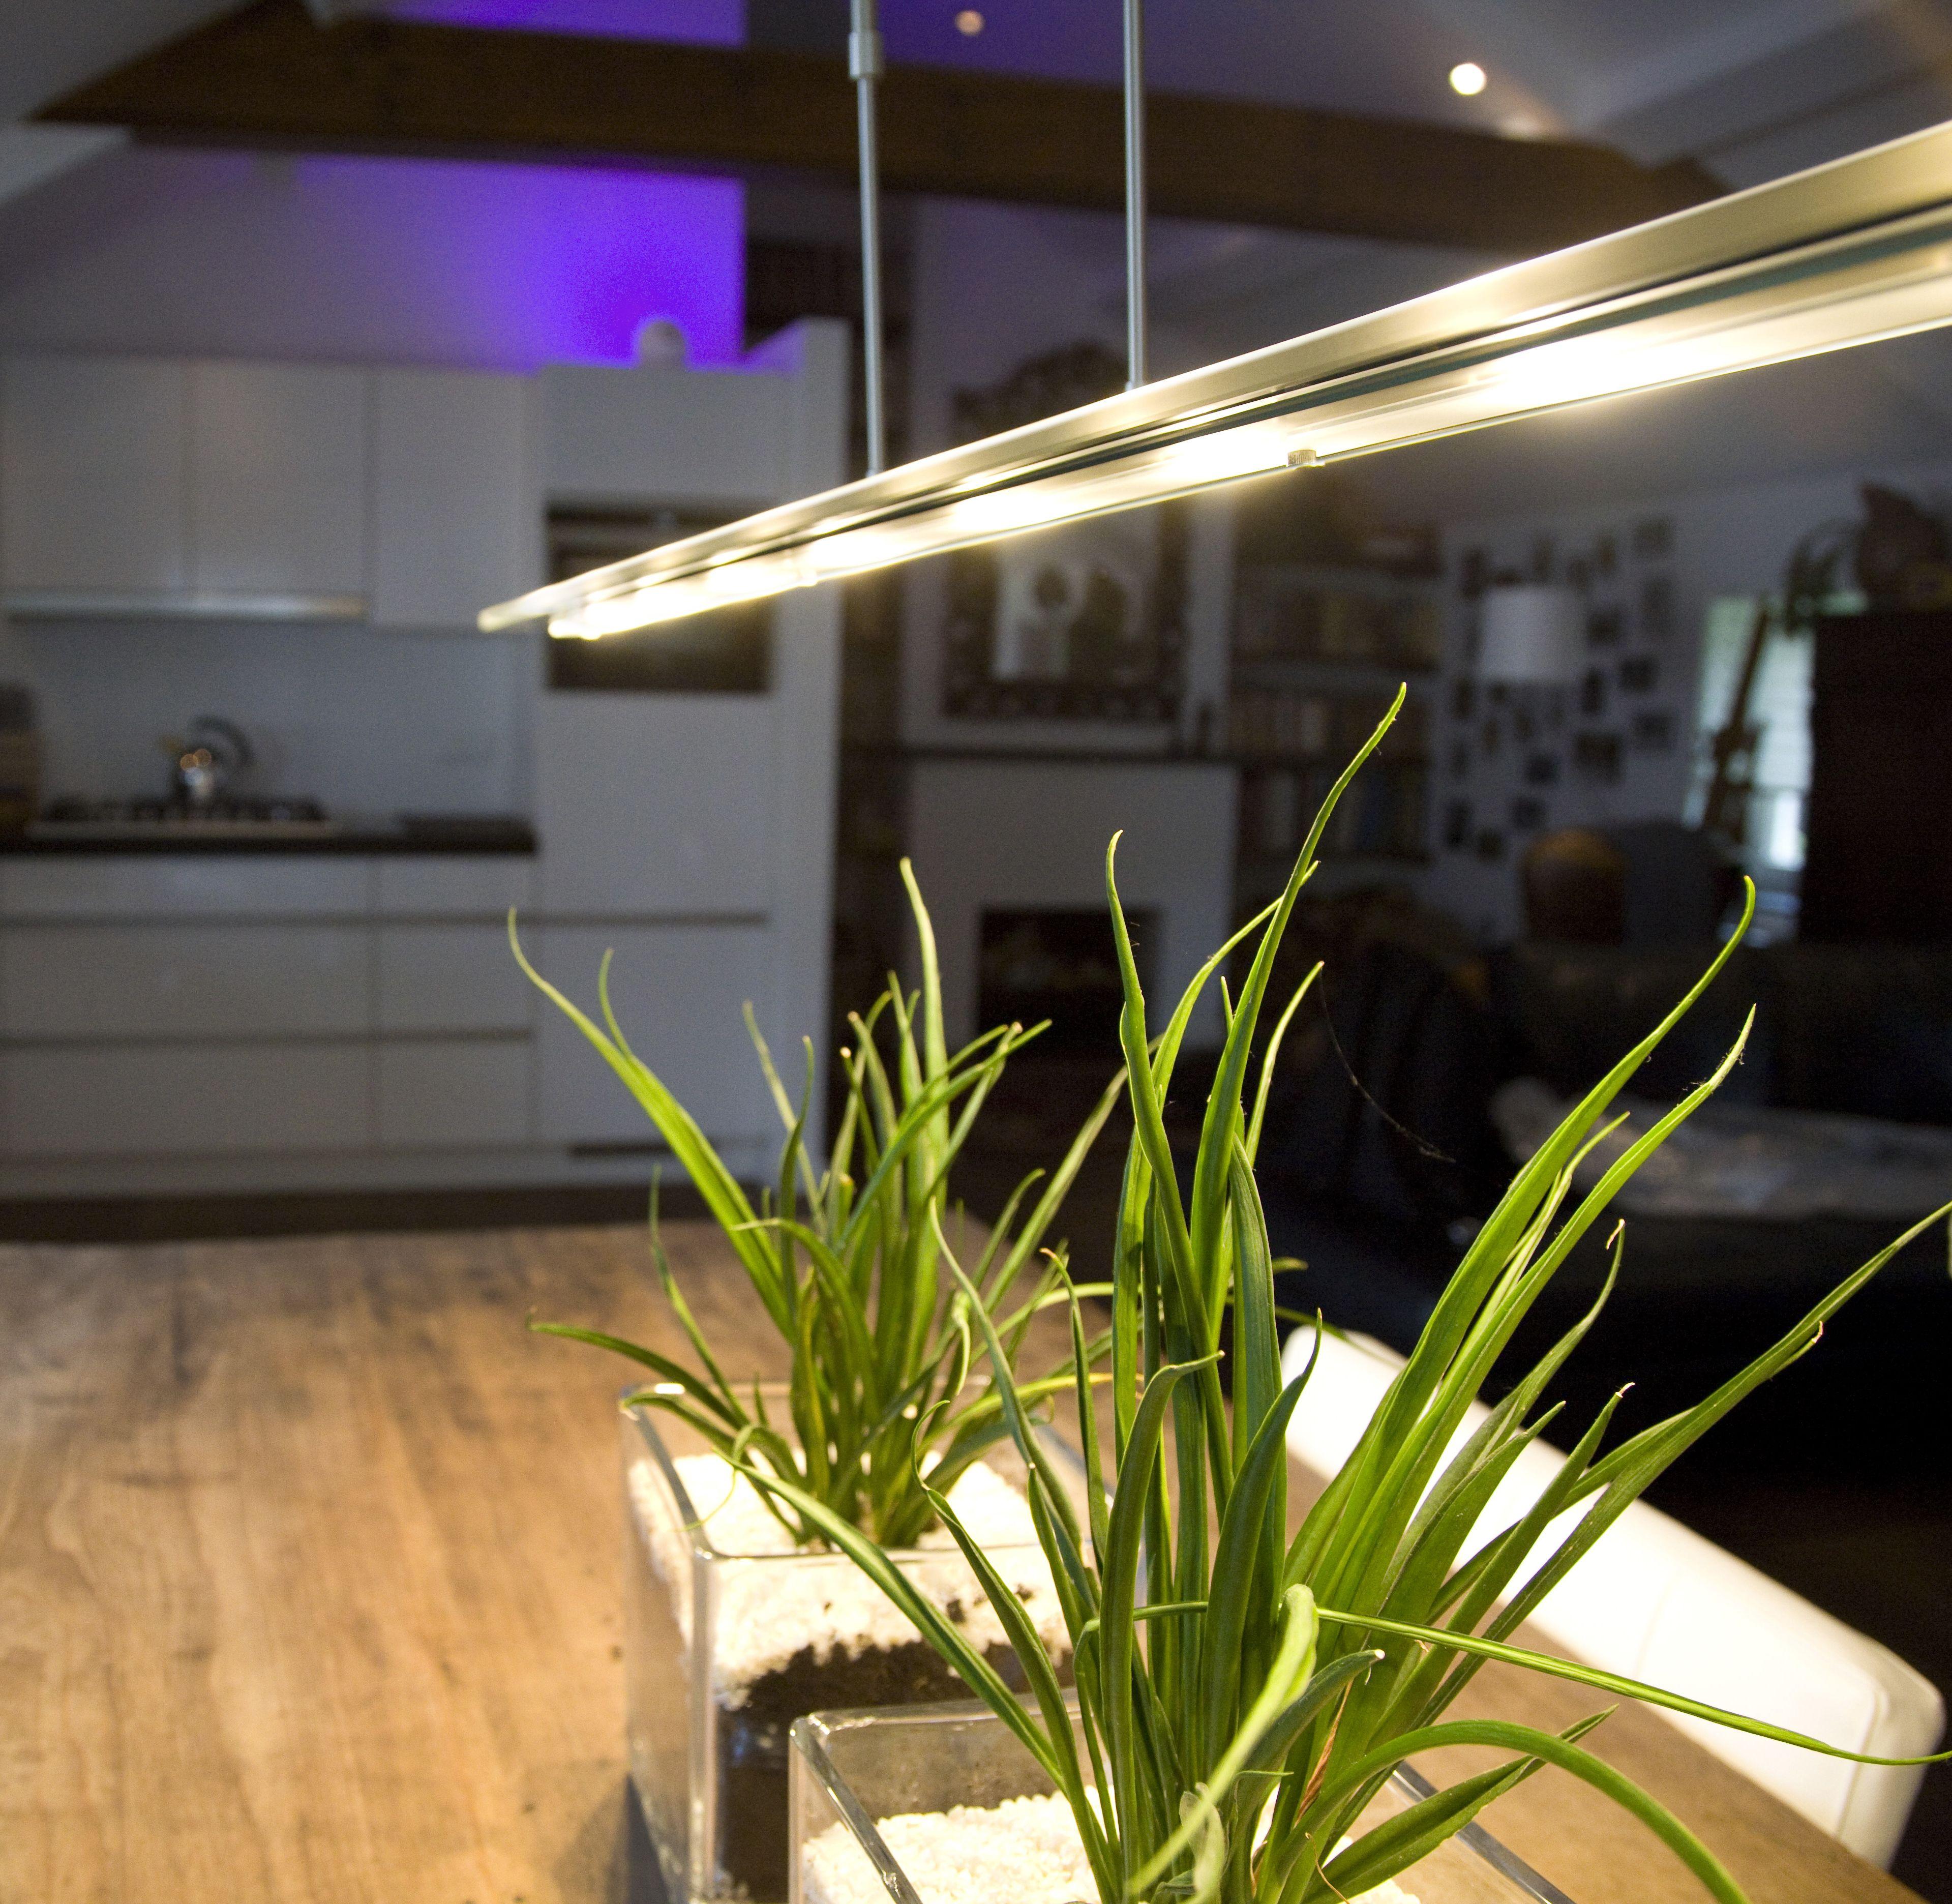 design hanglamp glasplaat met led verlichting wwwbanninkverlichtingnl